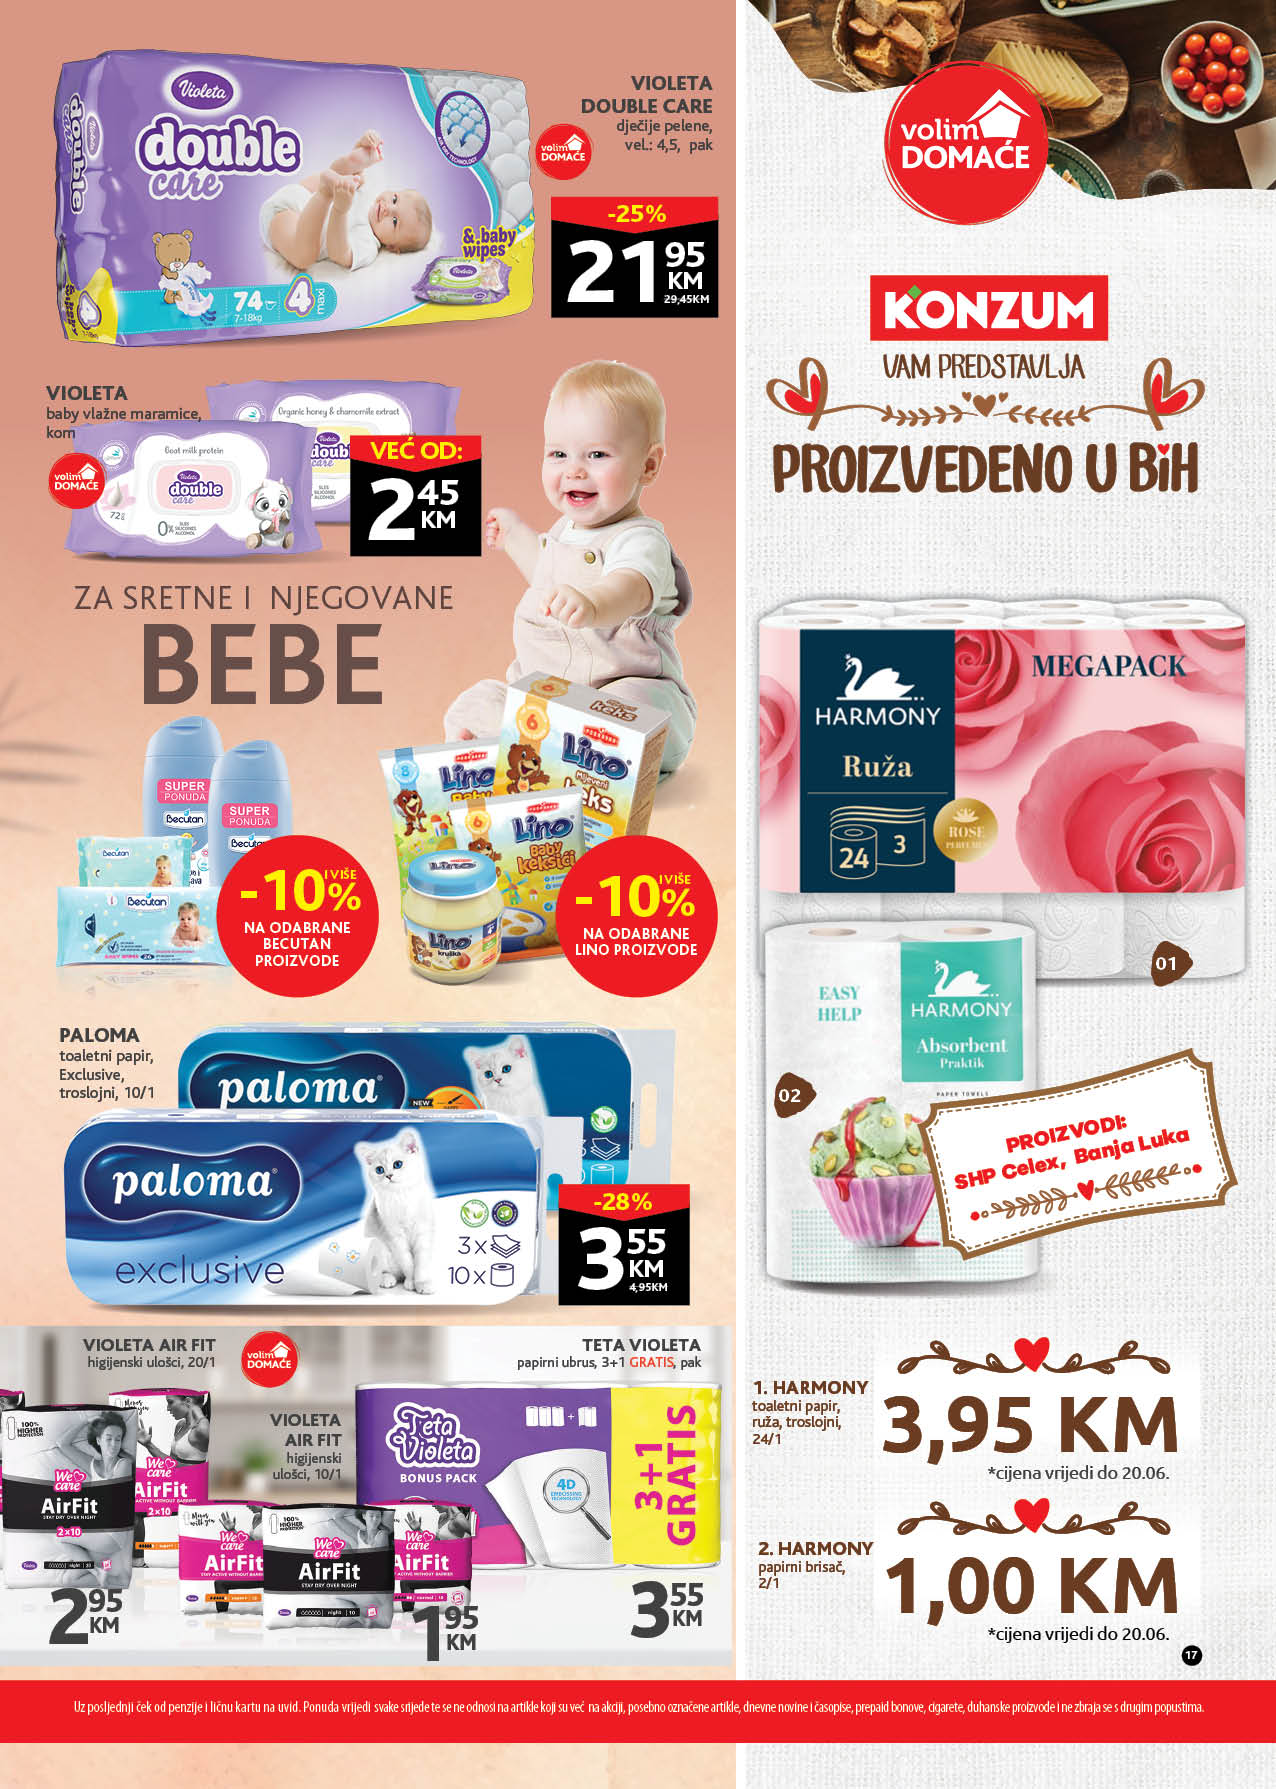 KONZUM Katalog Redovni katalog JUN 2021 07.06. 17.06. eKatalozi.com PR Page 17